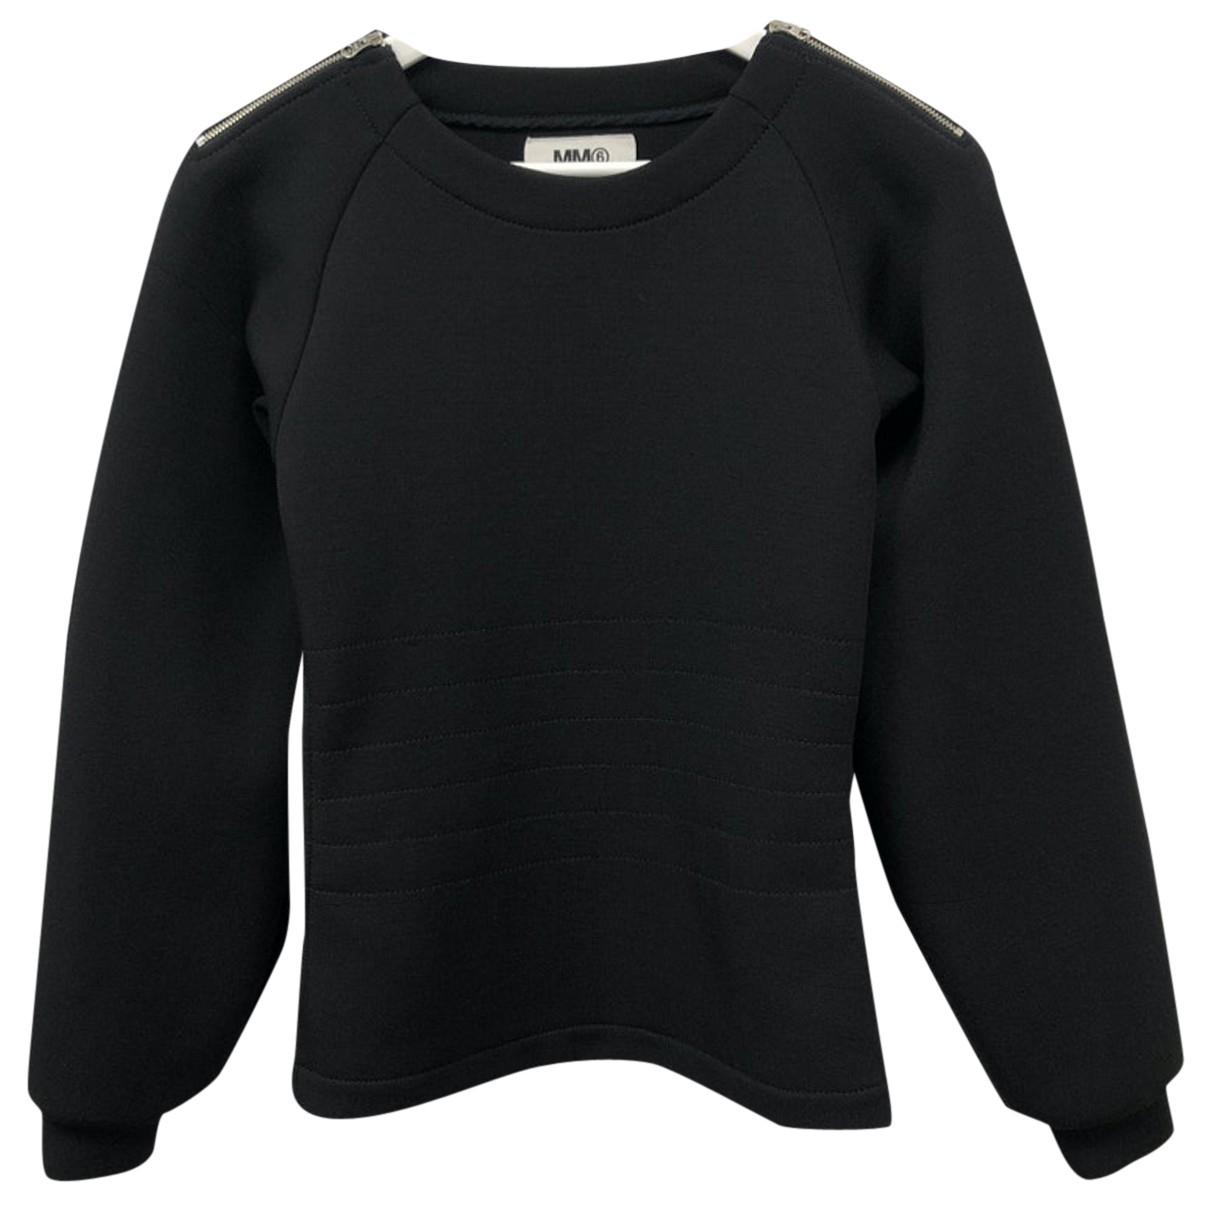 Mm6 N Black  top for Women M International